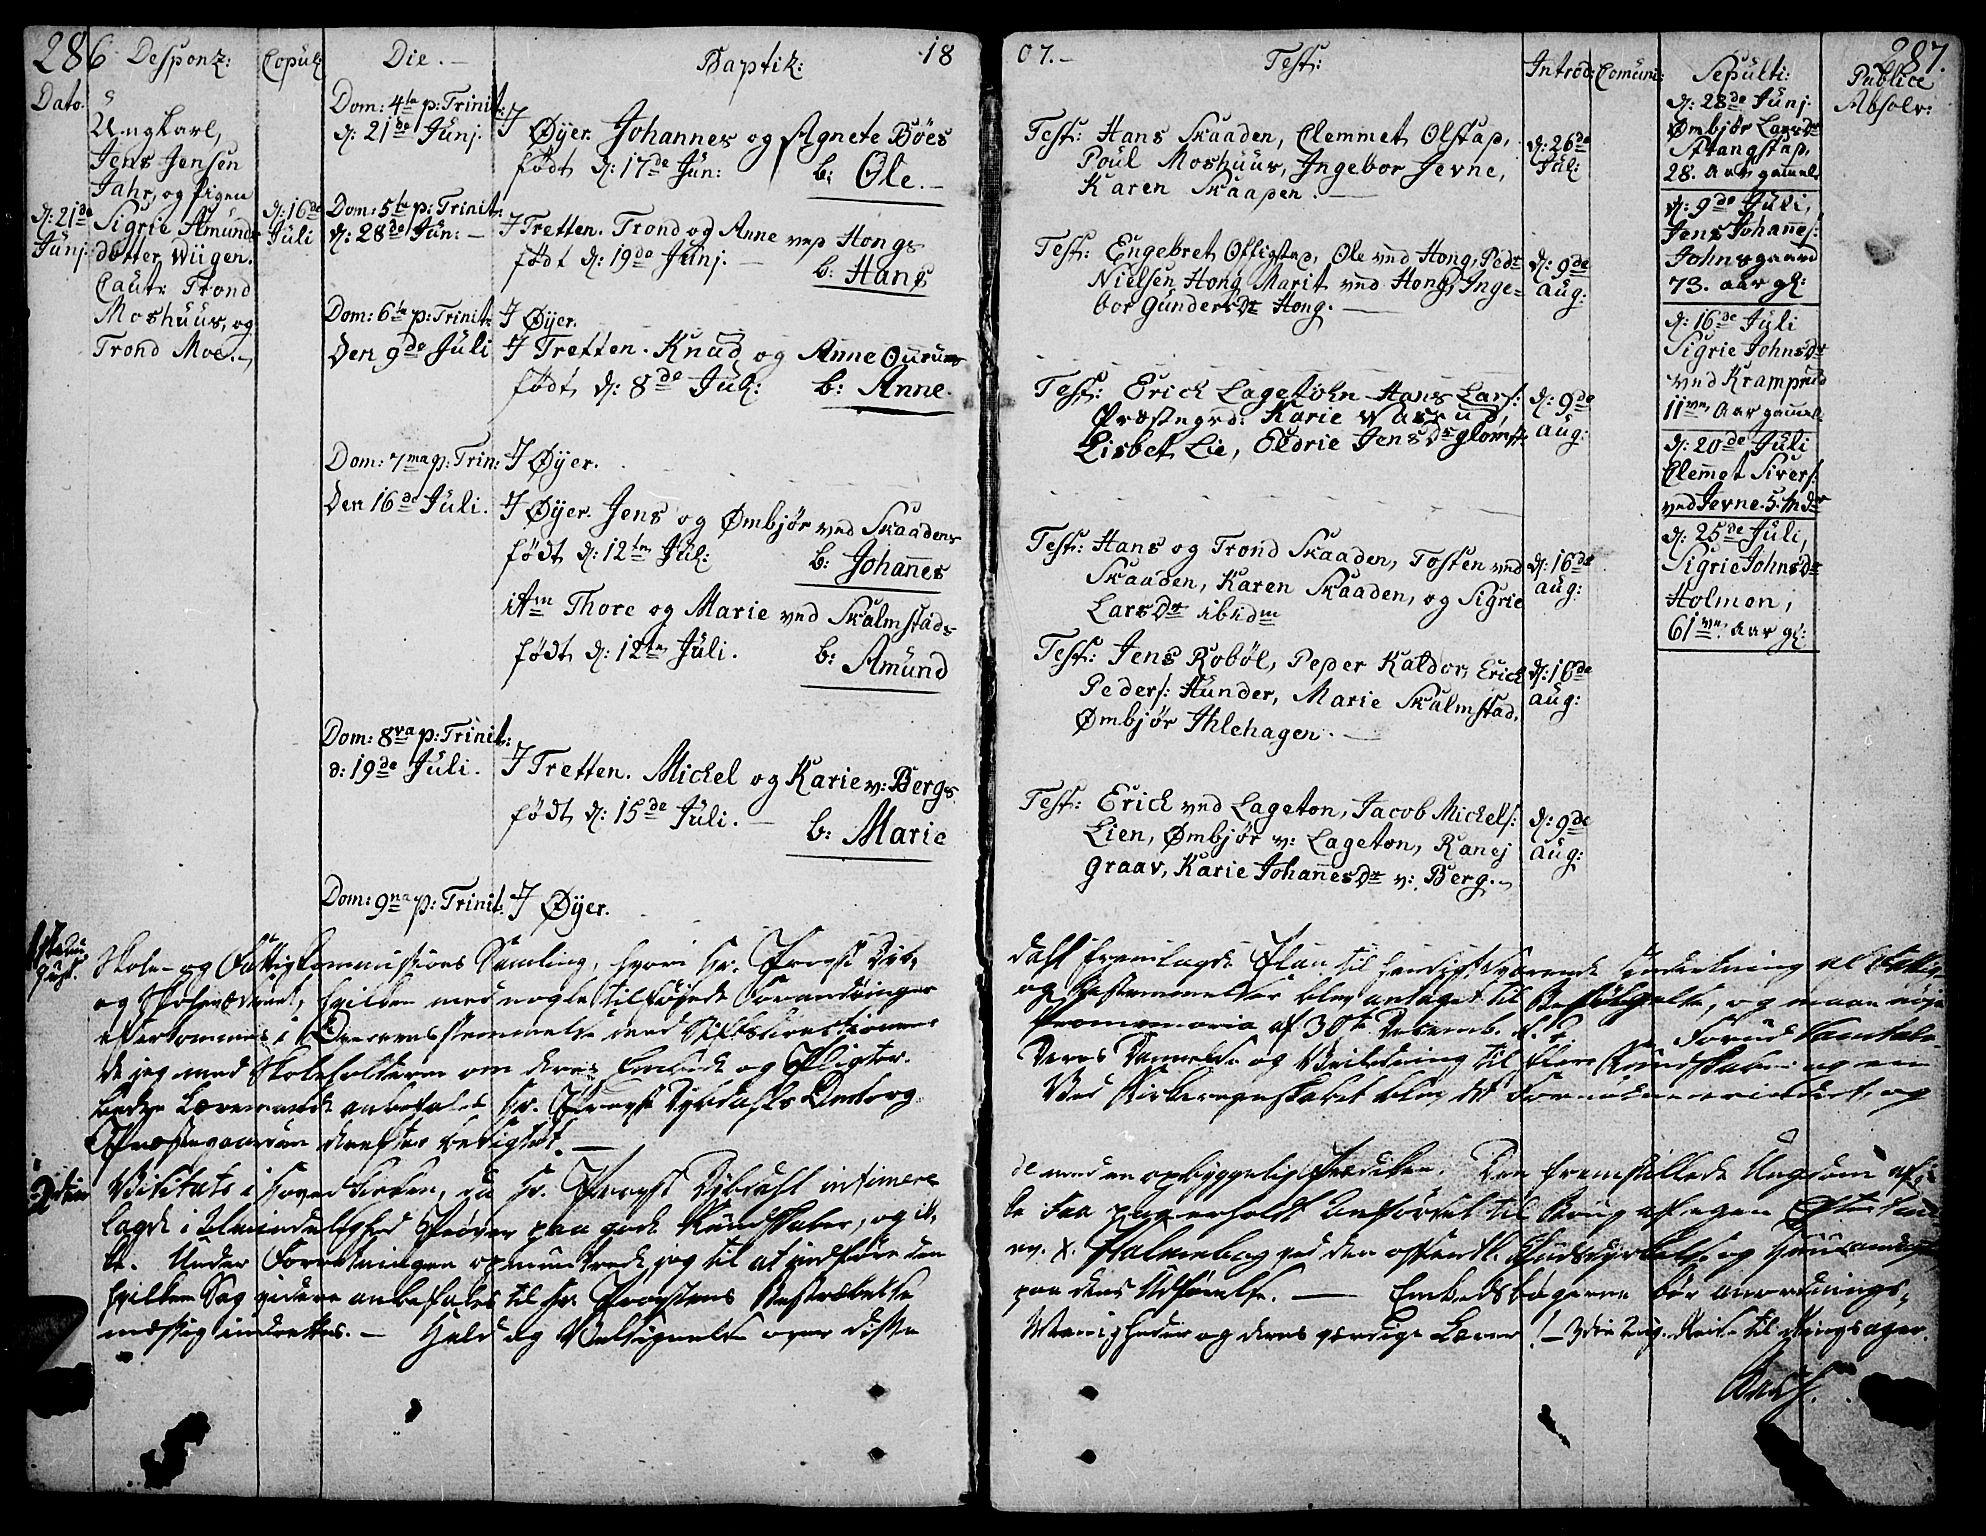 SAH, Øyer prestekontor, Ministerialbok nr. 3, 1784-1824, s. 286-287